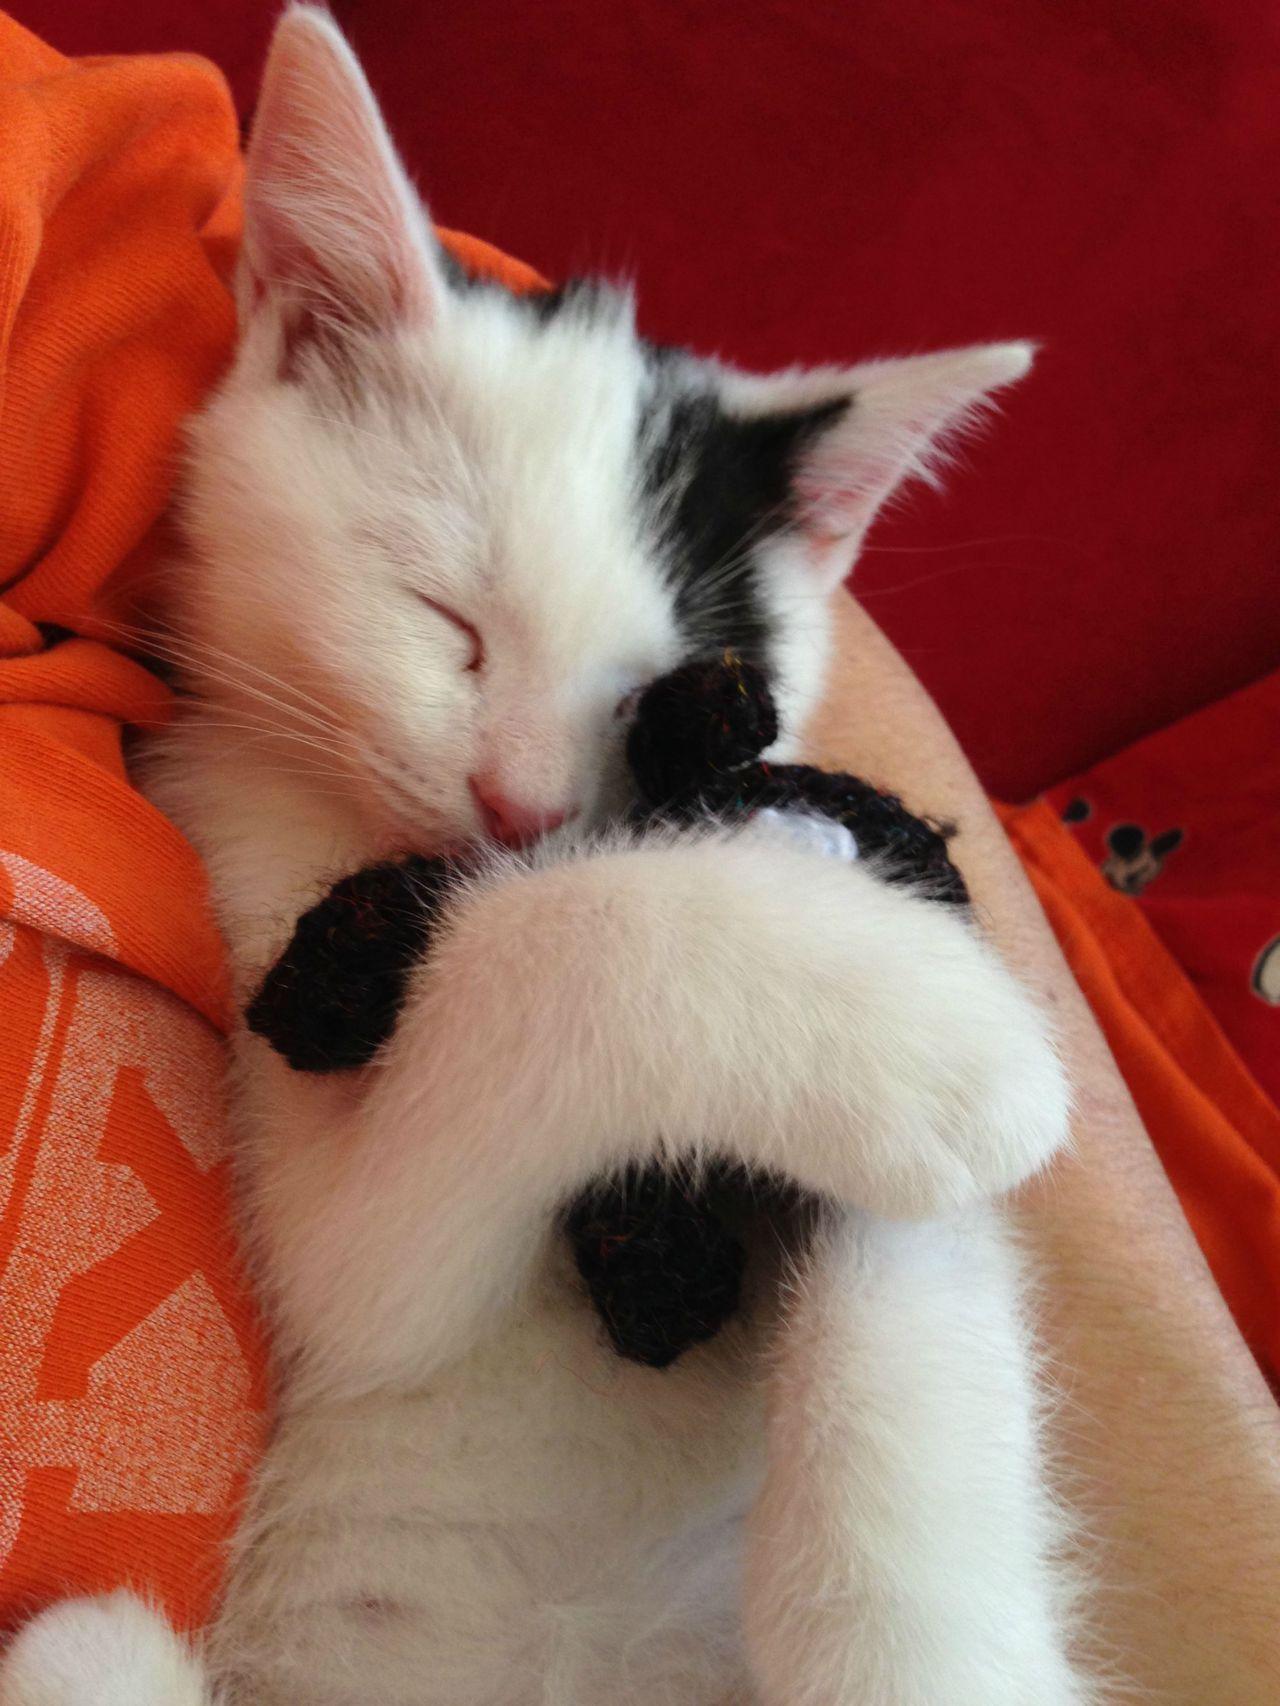 My Kitten Fell Asleep Hugging His Favorite Stuffed Animal Pets Cuddling Cute Little Kittens Cute Animals